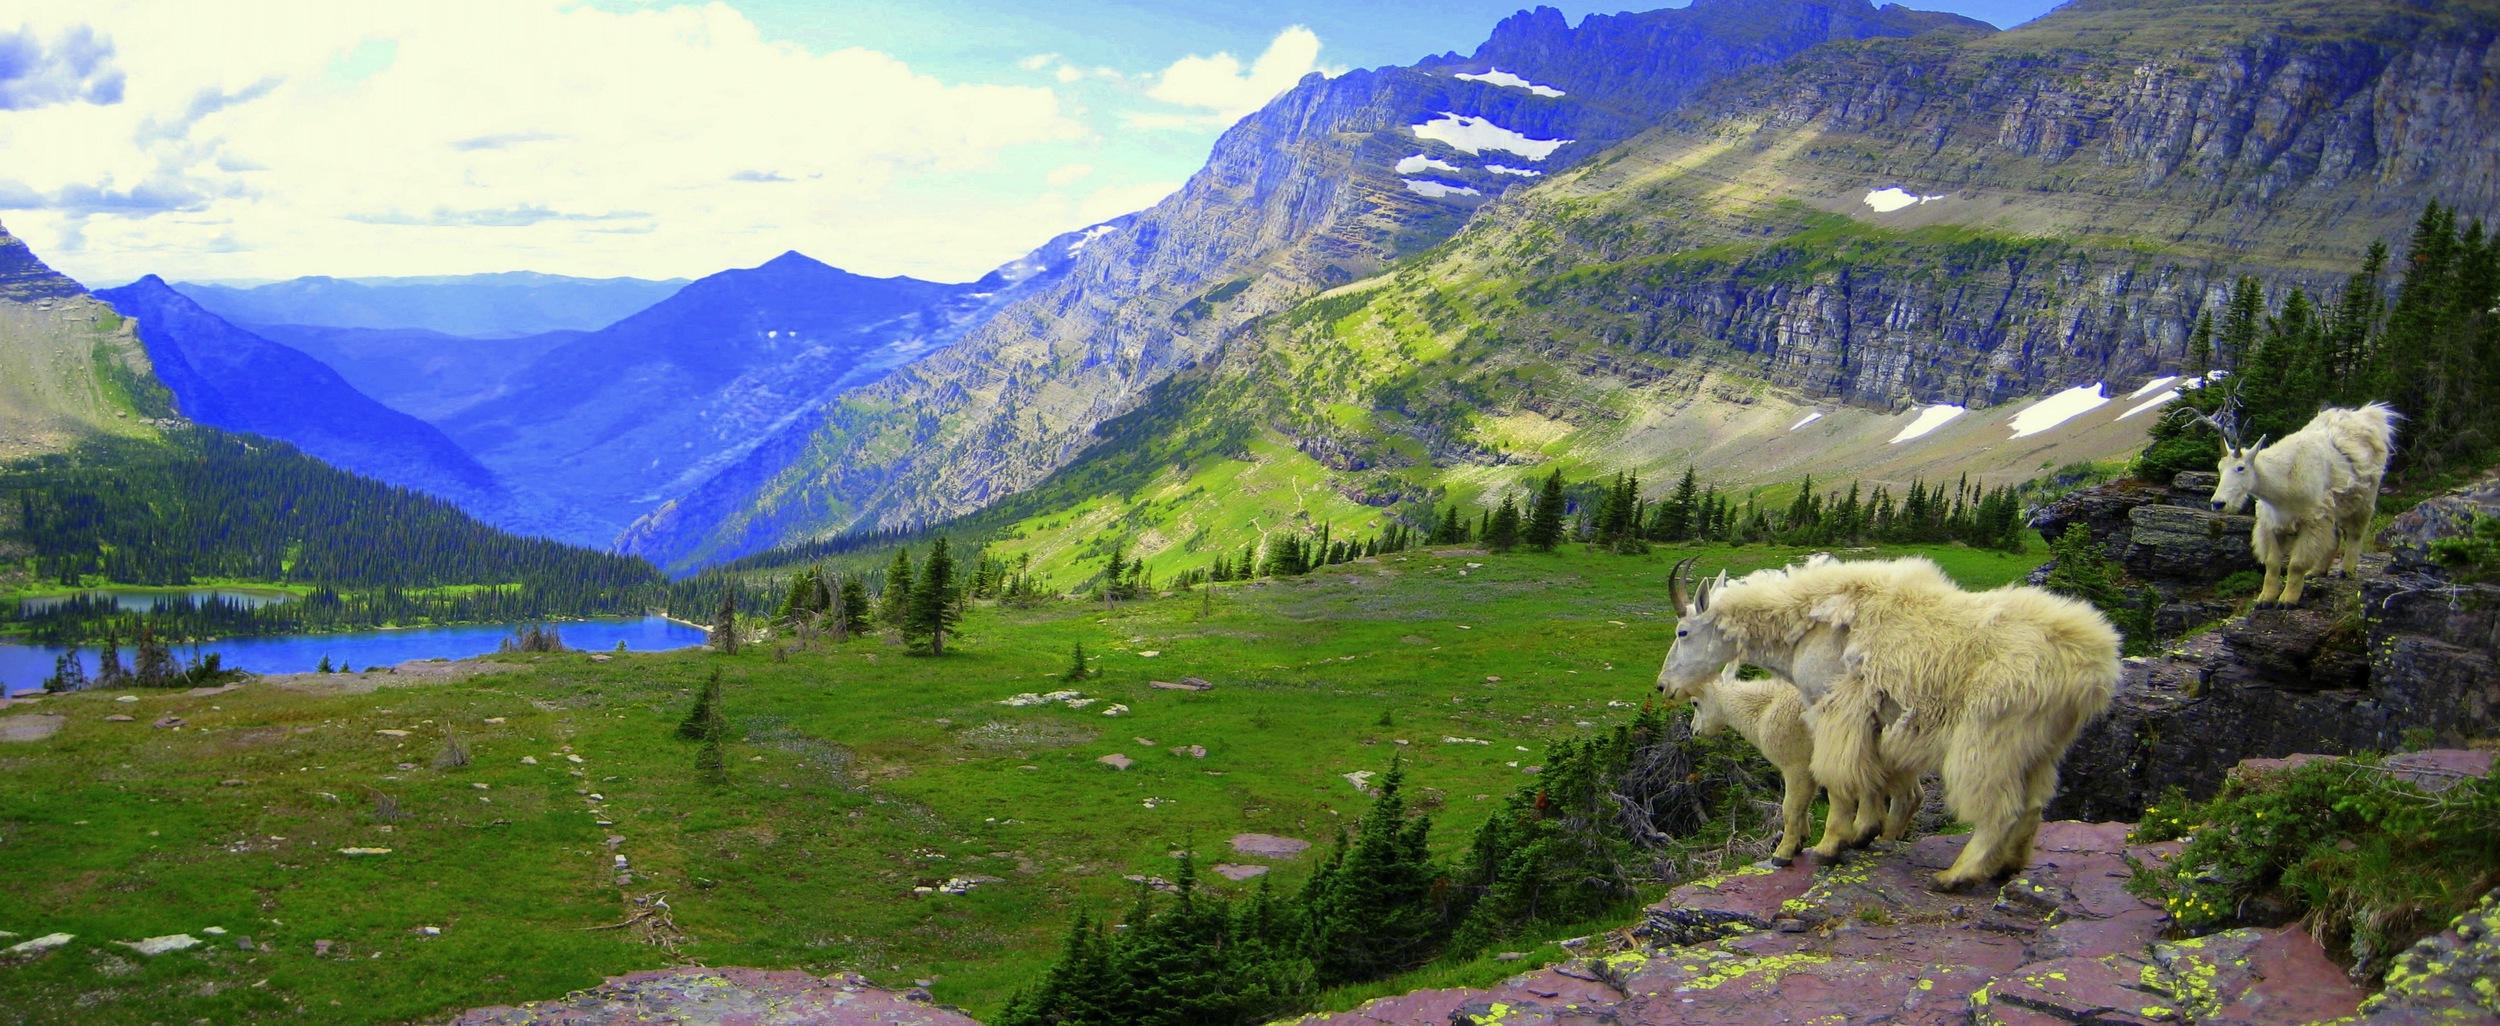 Glacier National Park, near Columbia Falls,  Montana